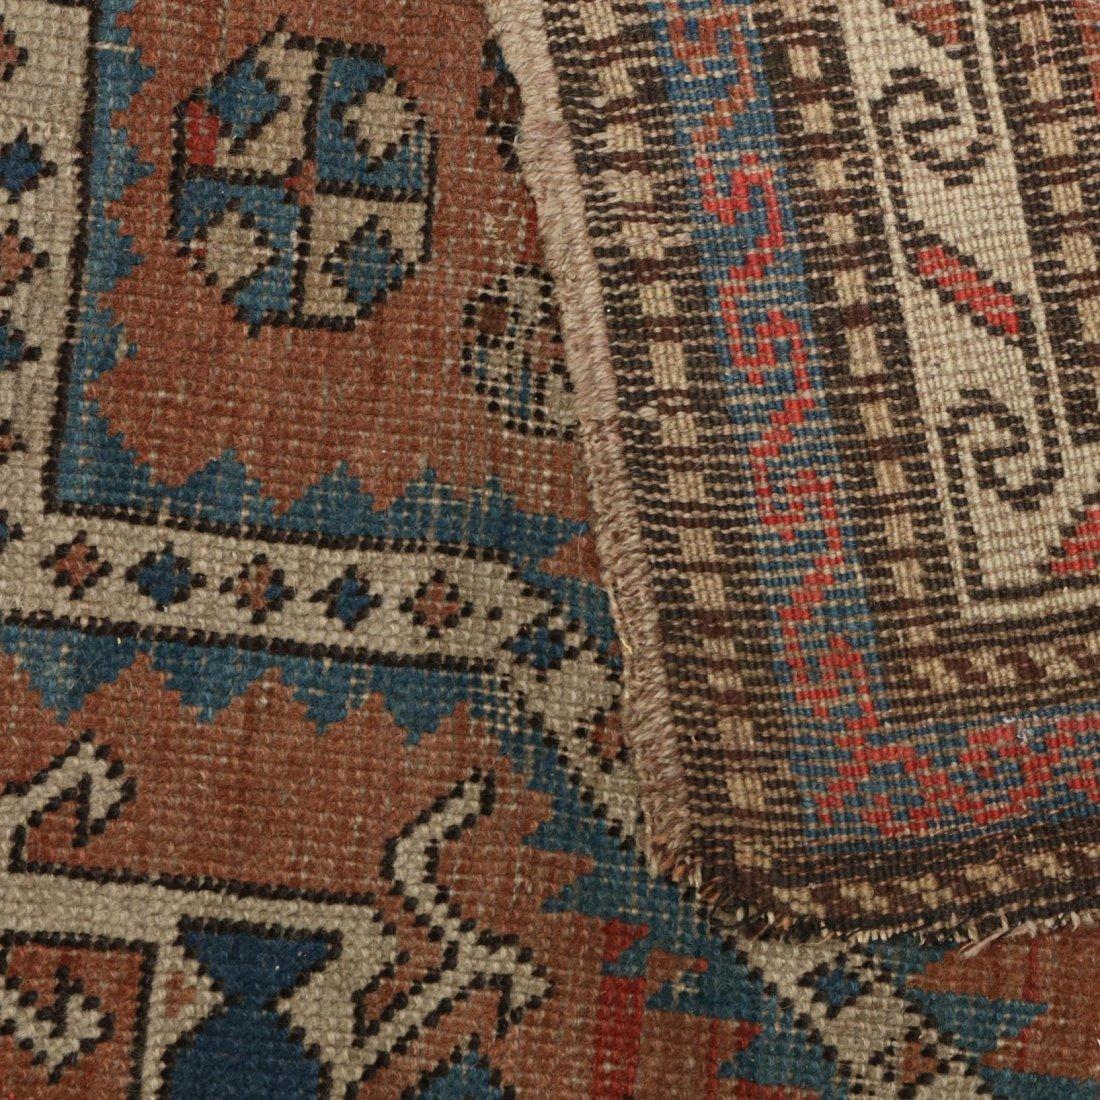 Two Semi Antique Persian Area Rugs - 3